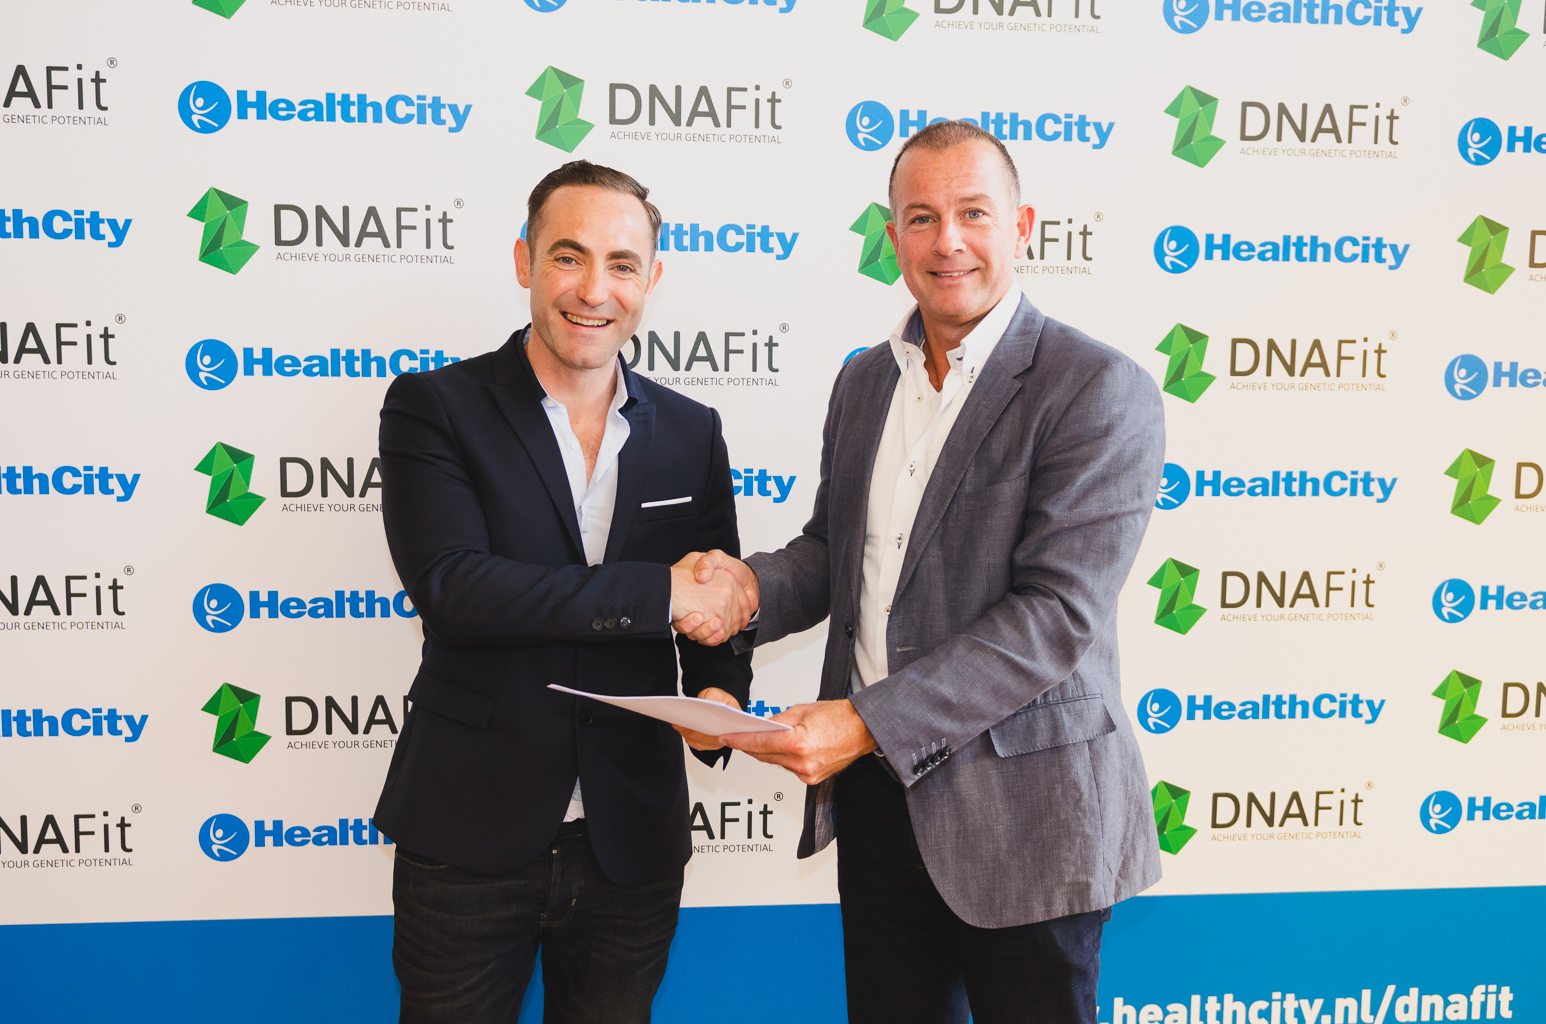 20140917 Healthcity DNAFit-009